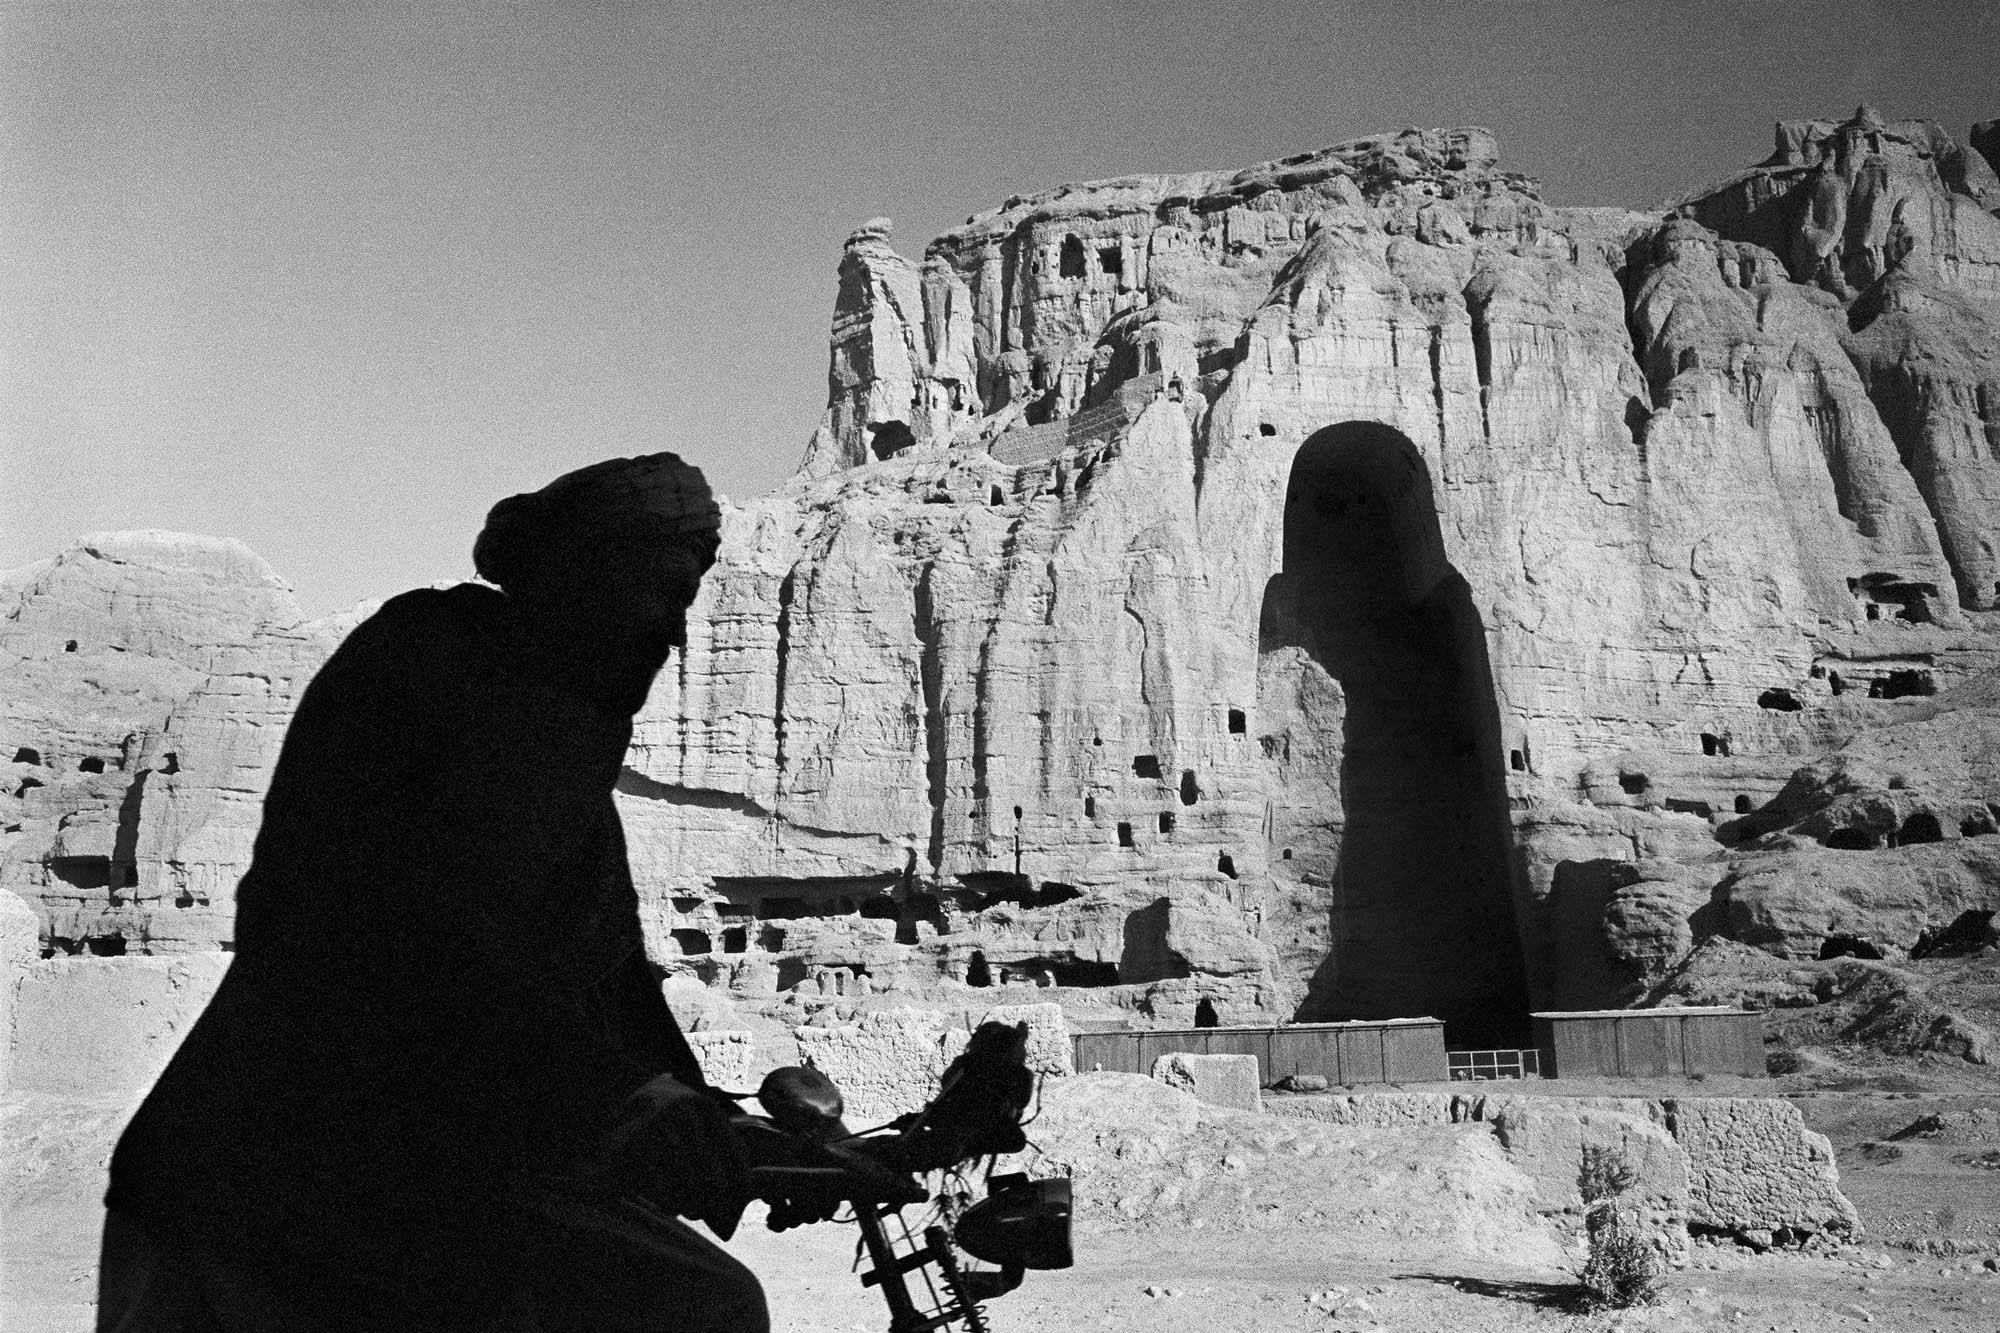 Generation AK: The Afghanistan Wars, 1993-2012